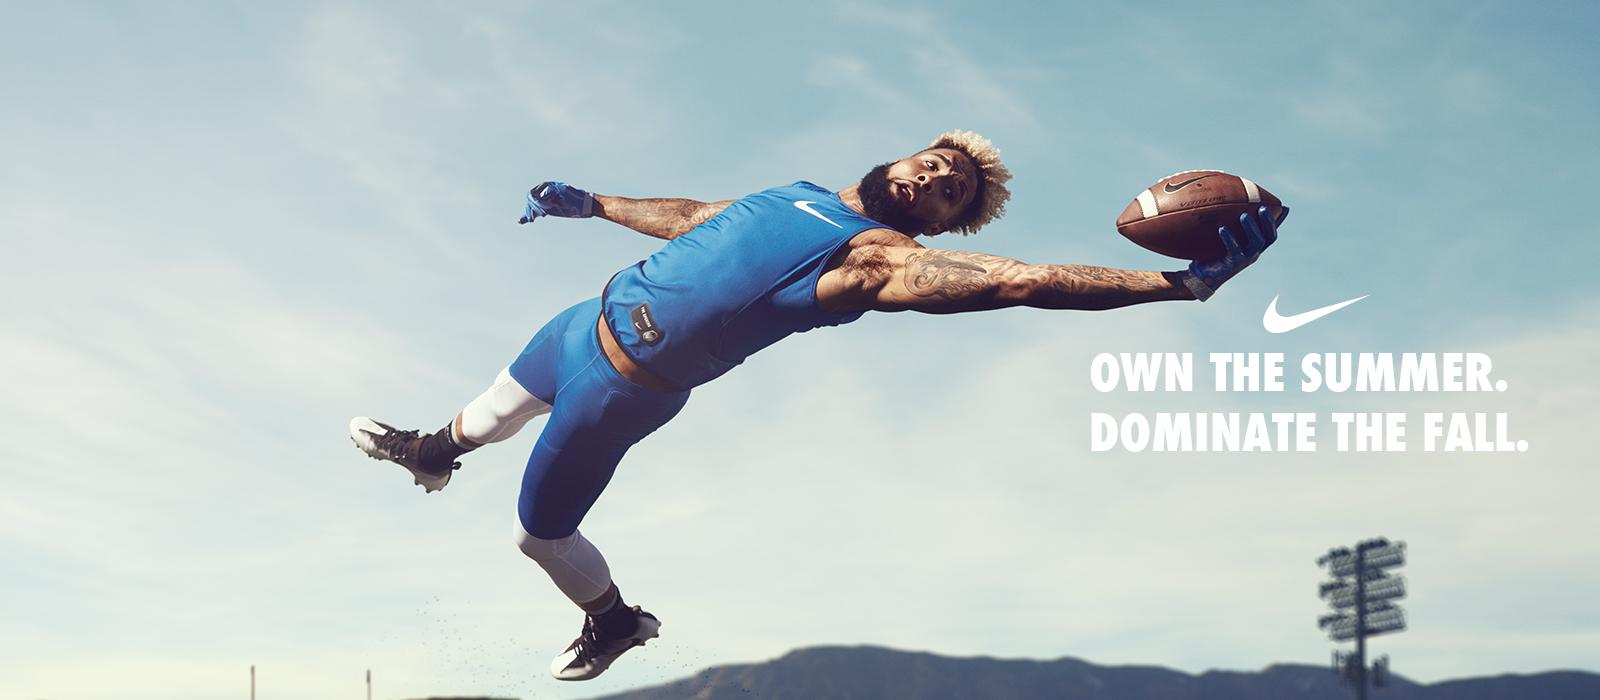 Custom Nike Uniforms - Nike Team Sports